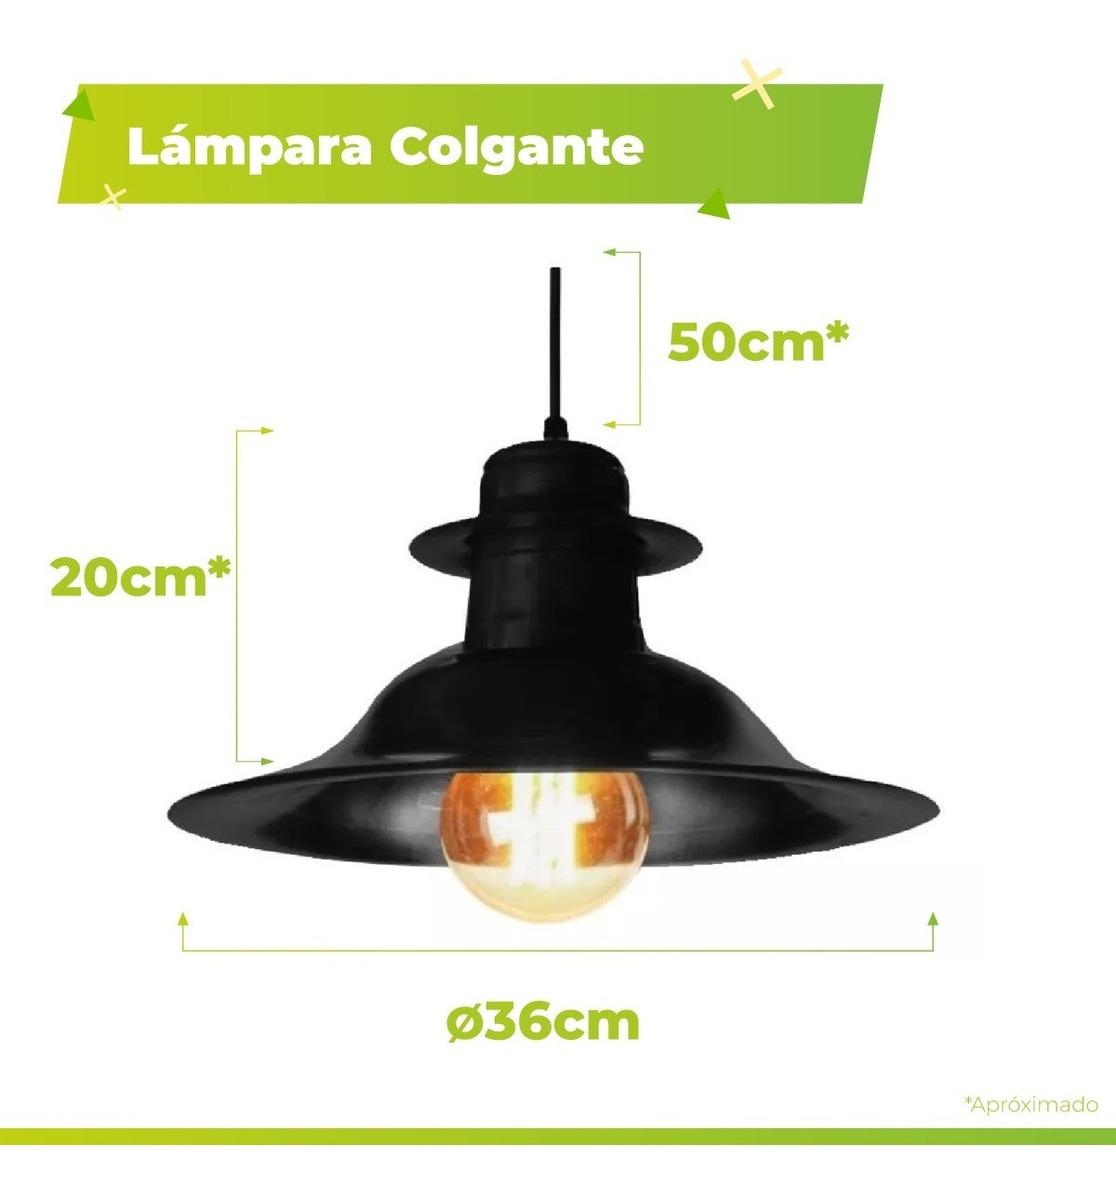 Negro 1 35cm Luz Lampara Blanco Vintage Colgante Galponera VqzGUMpS